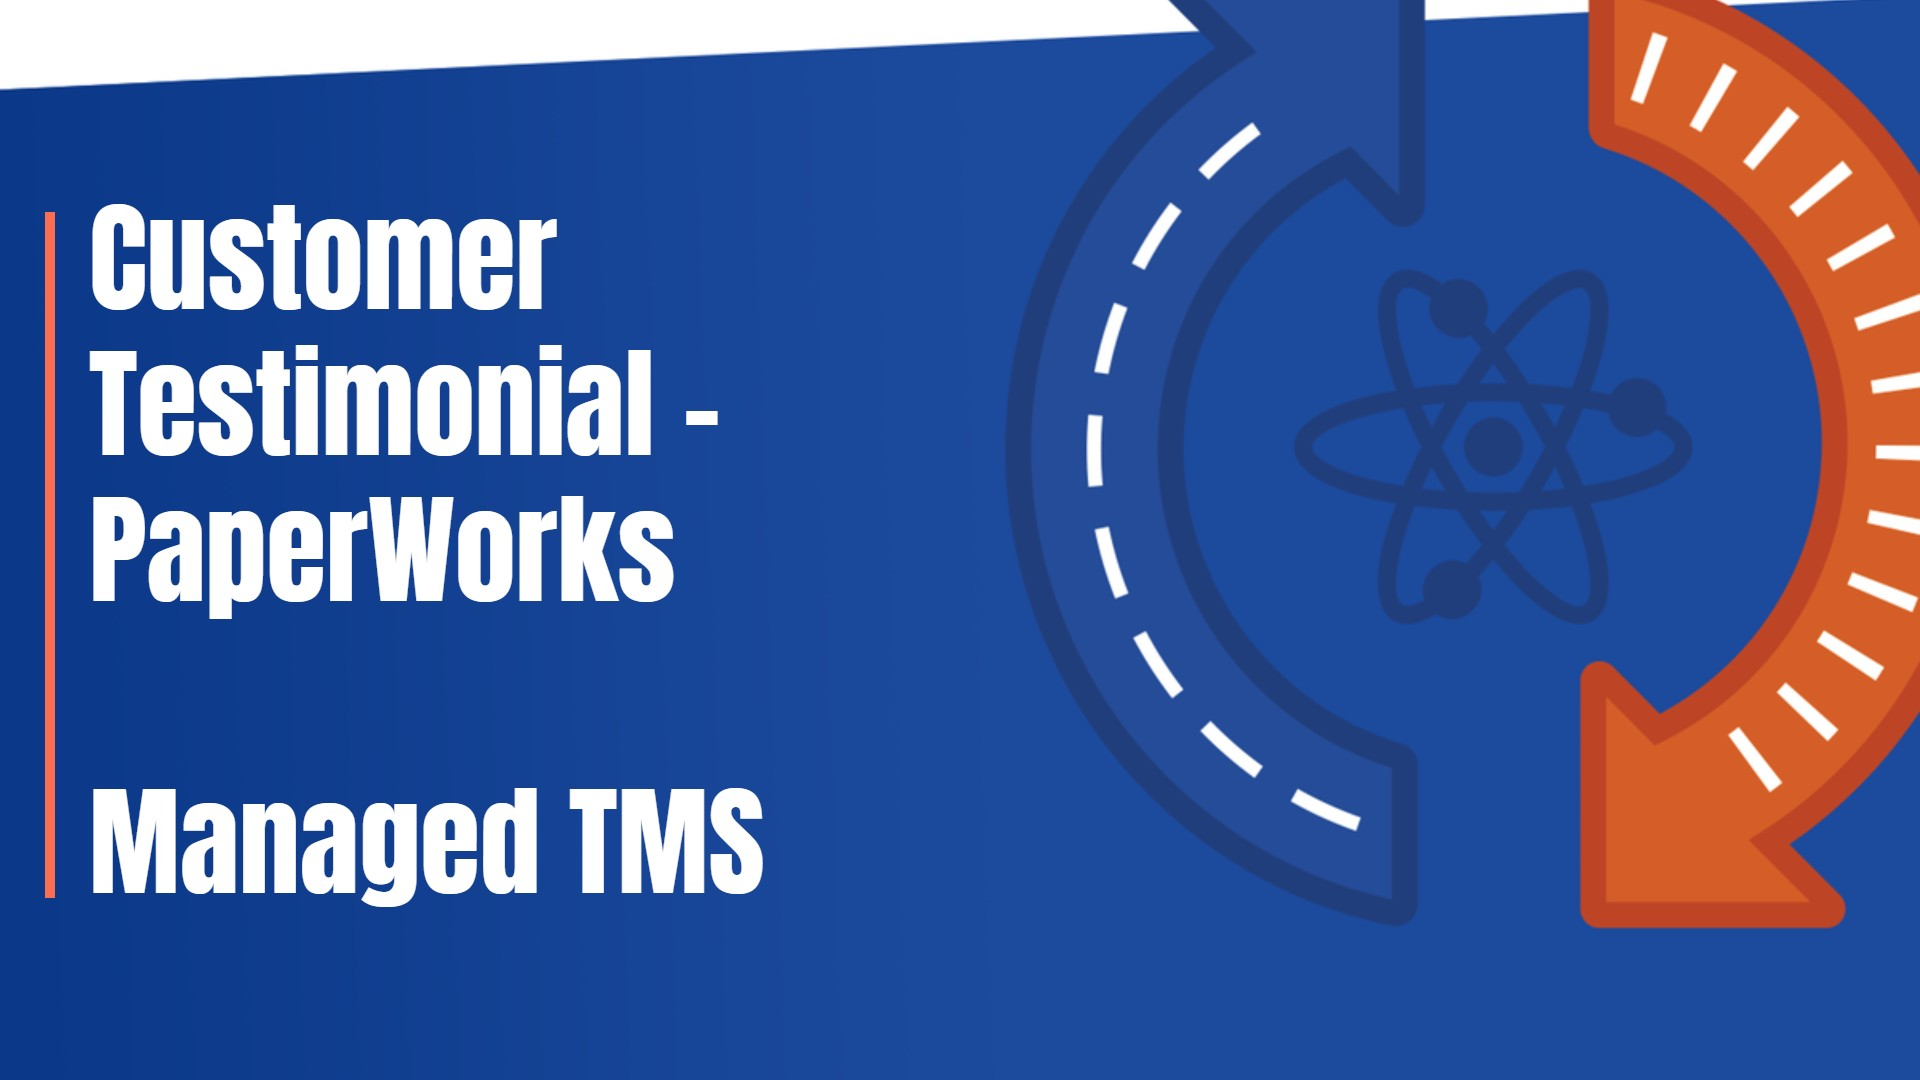 InTek Logistics Managed TM Customer Testimonial